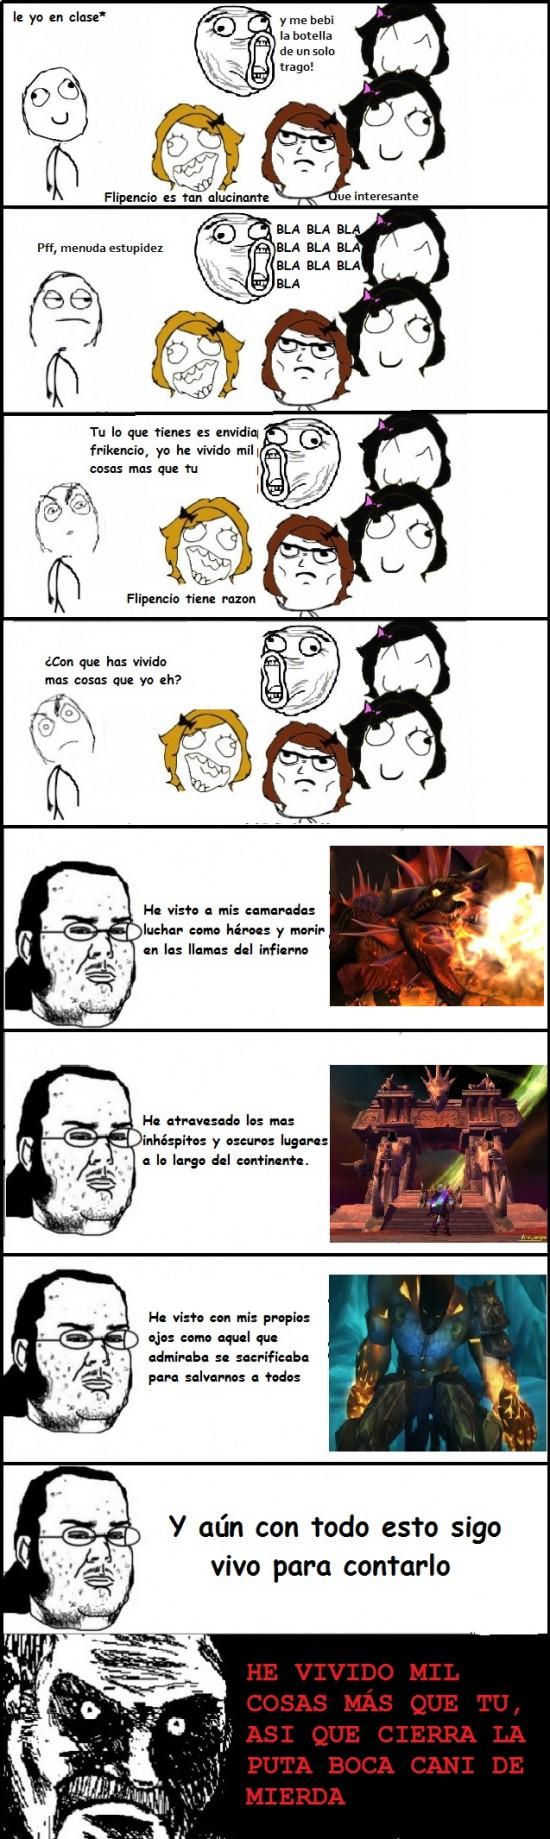 cani,Friki,gamer,lol,viciado,vida,vivir,world of warcraft,Wow